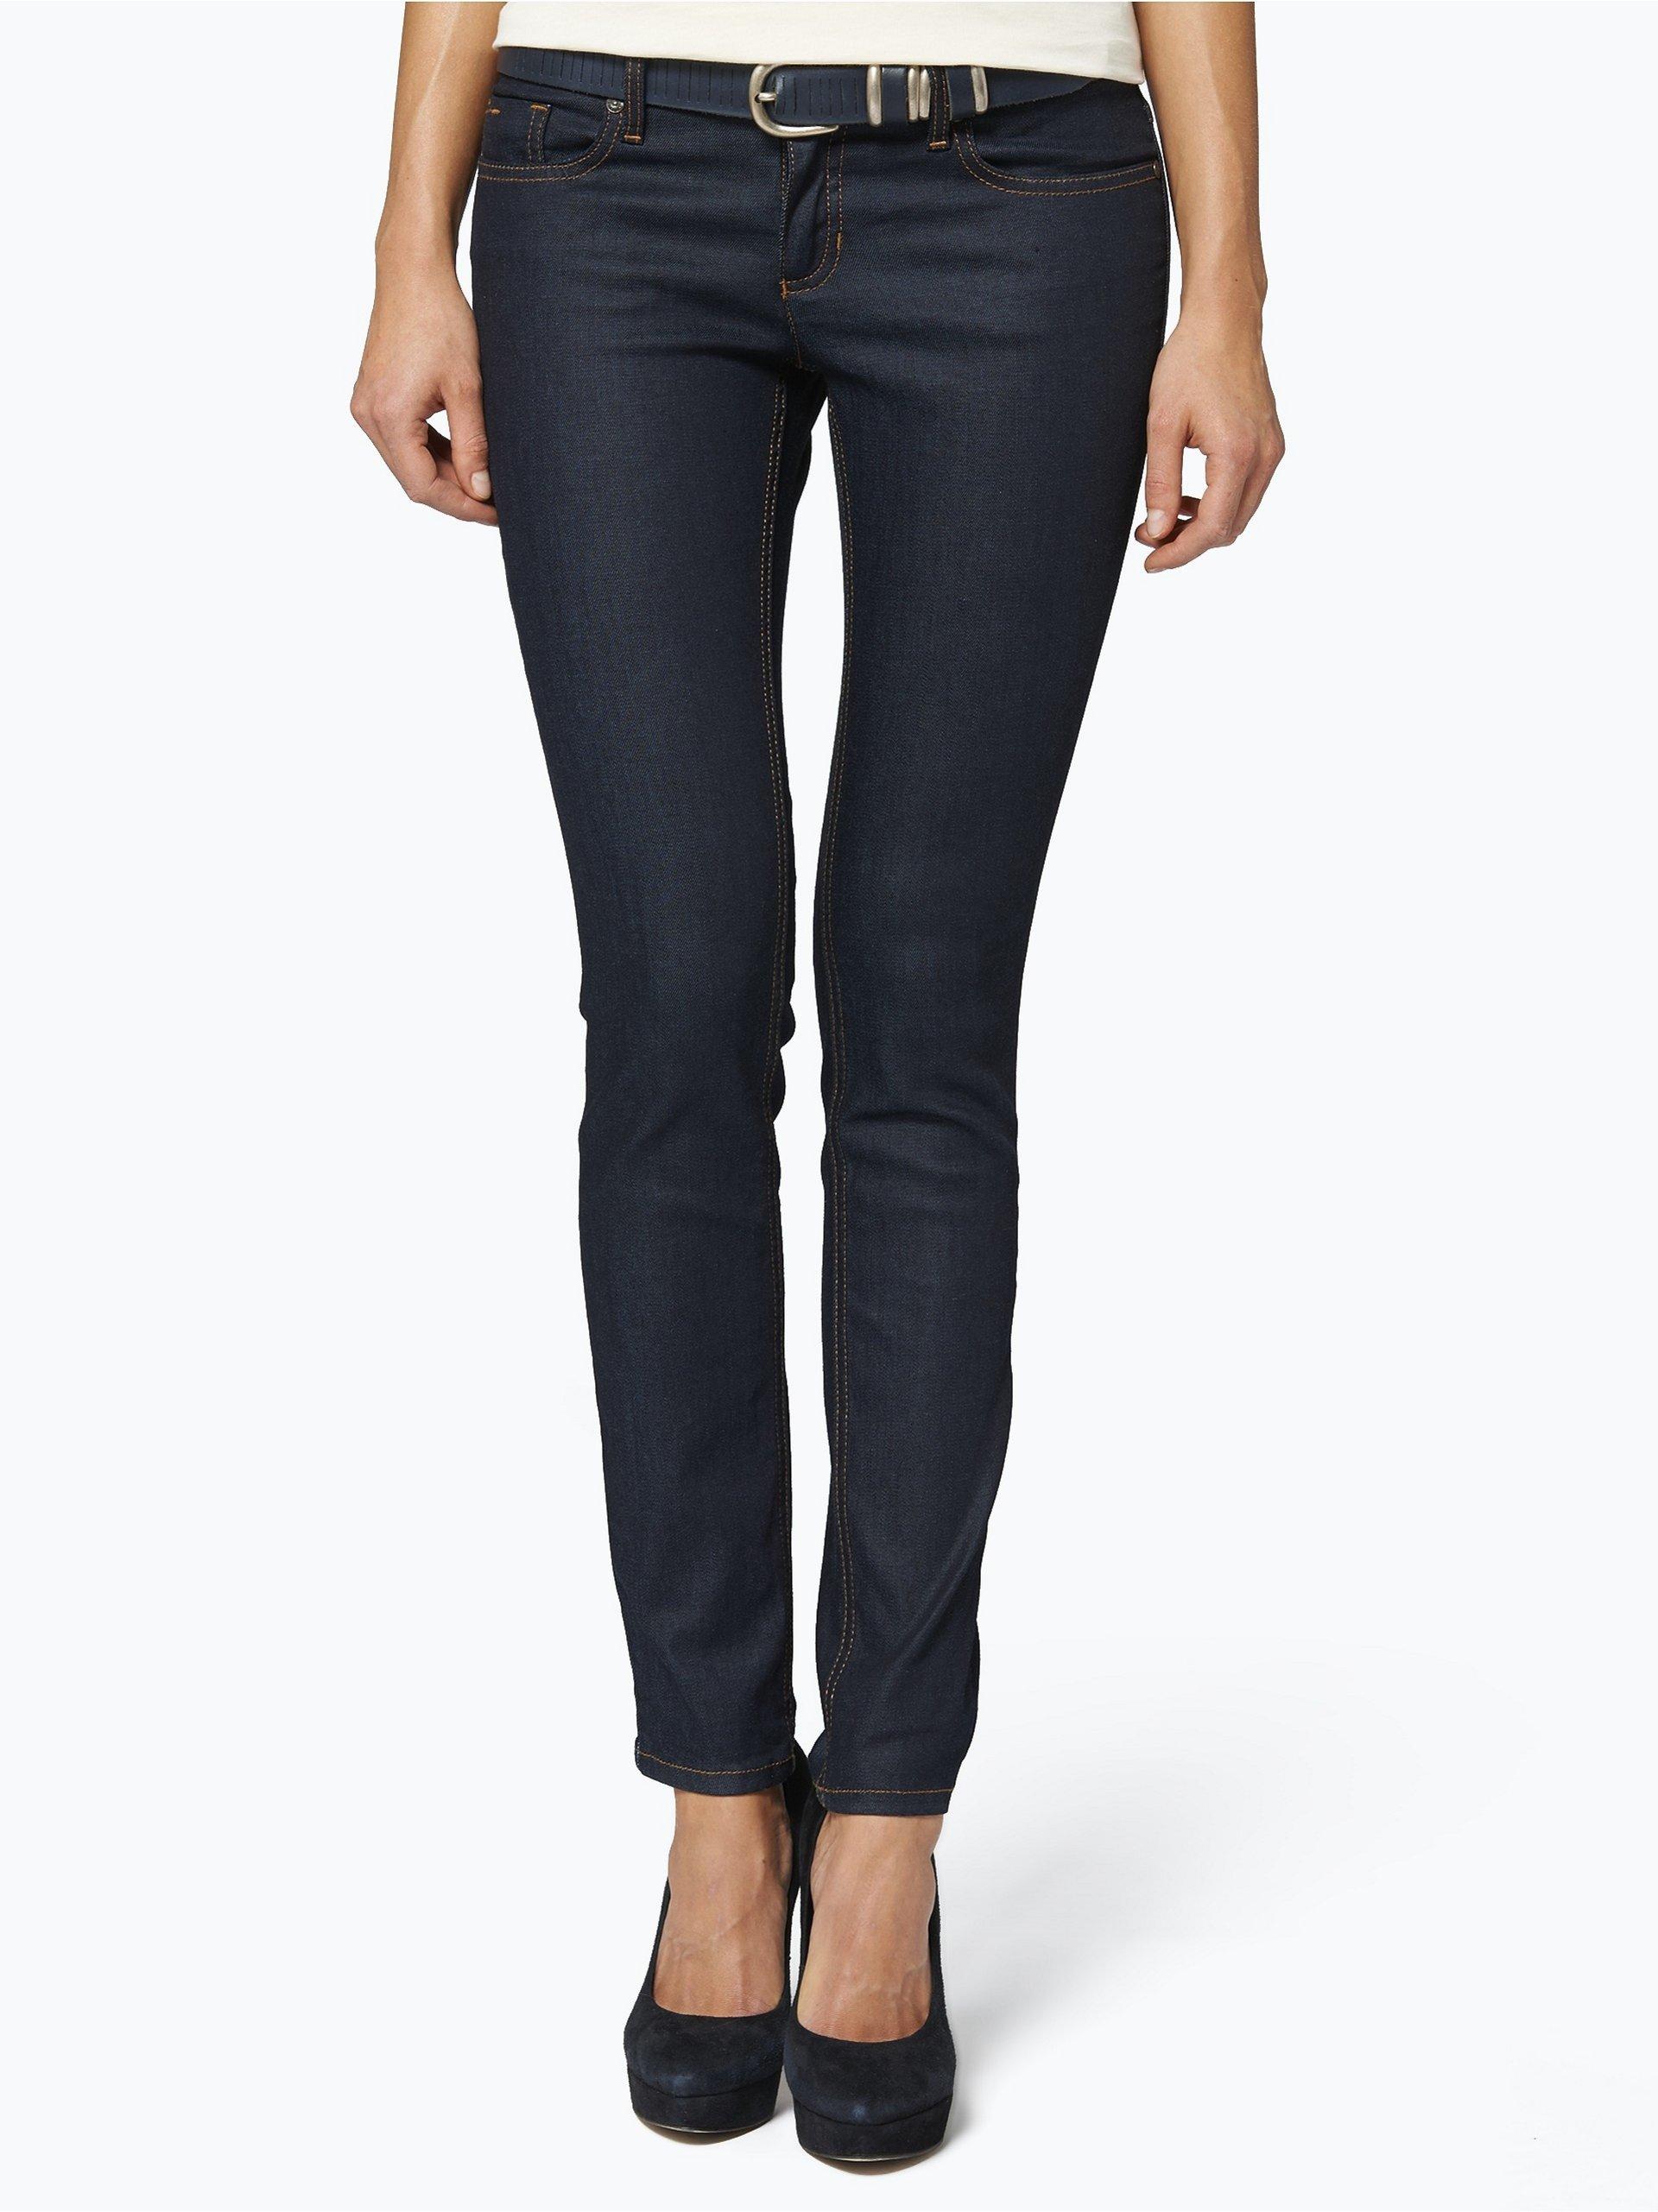 BOSS Casual Damen Jeans - Lunja 2